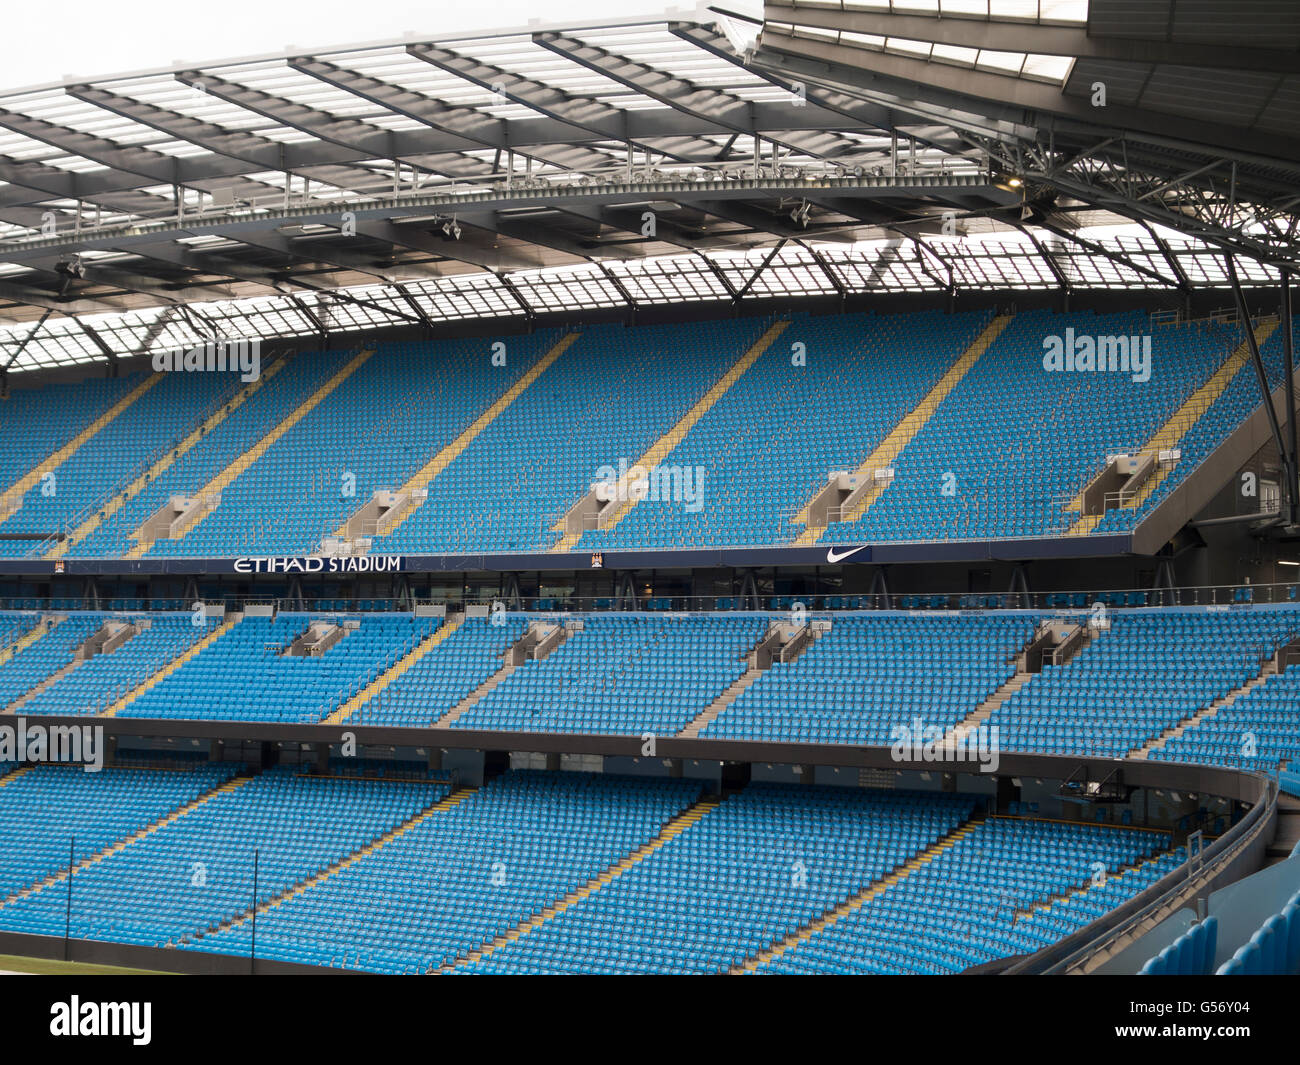 Seats inside Etihad Stadium Manchester CIty Football Club UK - Stock Image